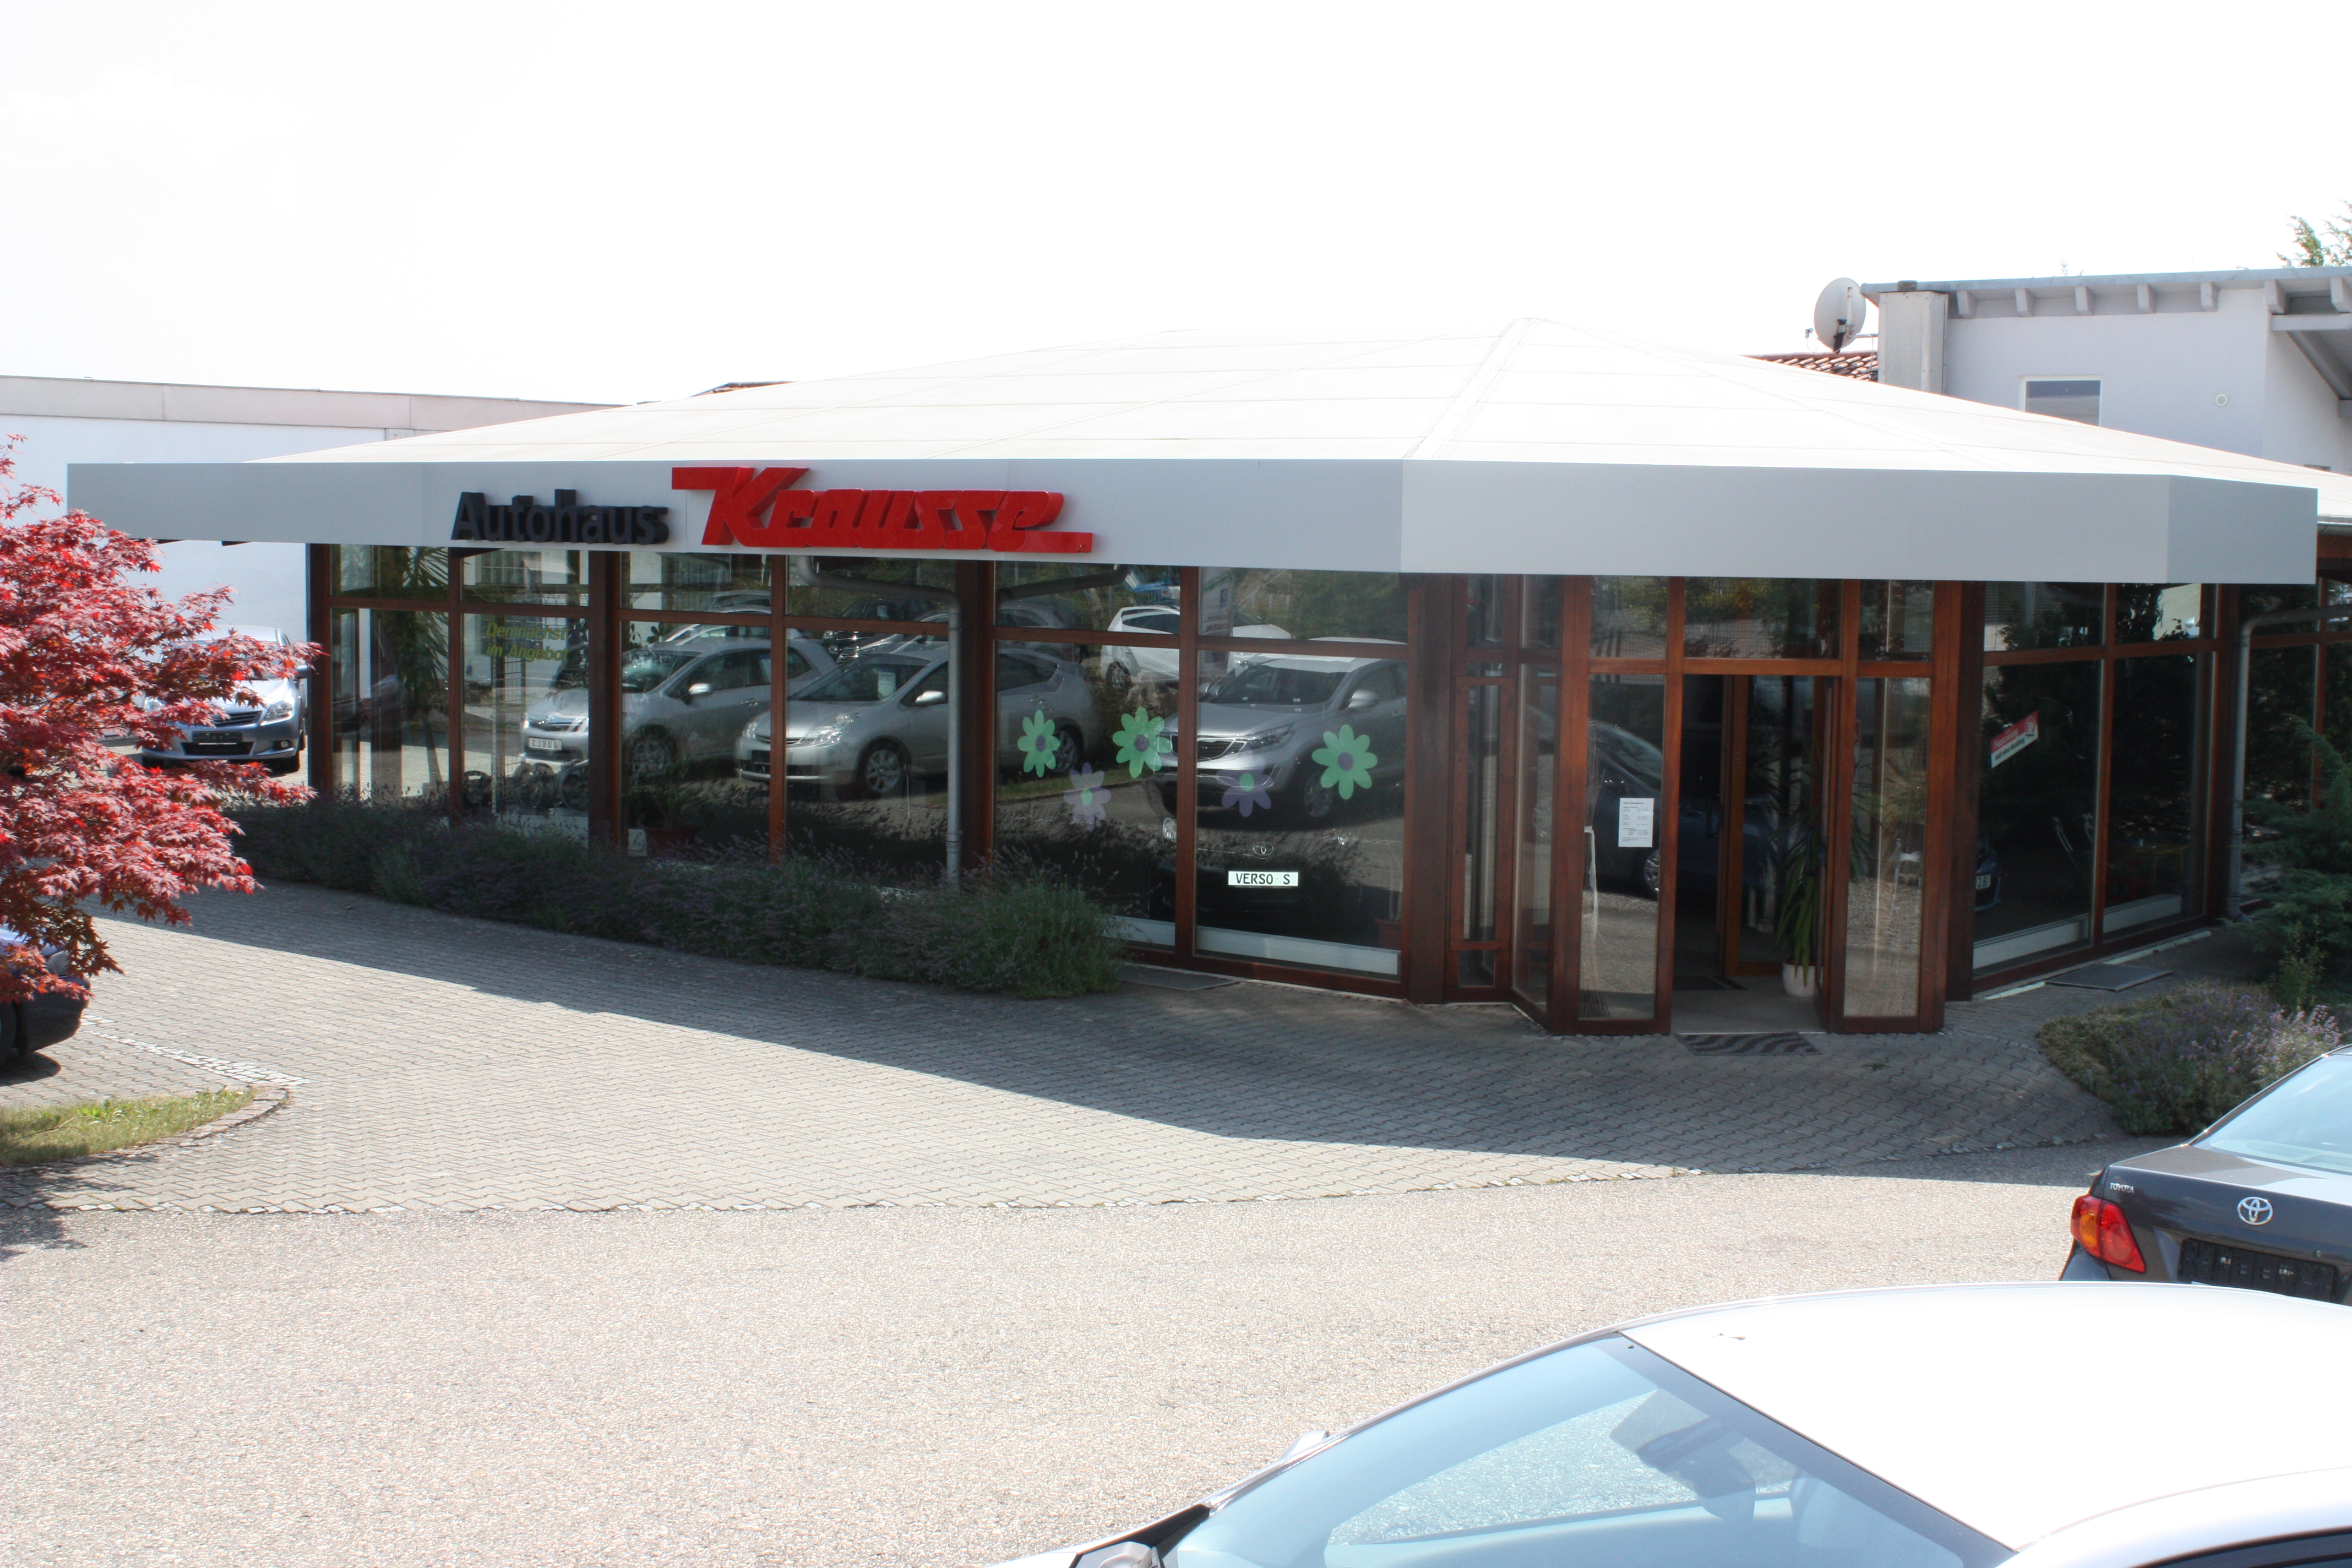 Fotos de Autohaus Krausse